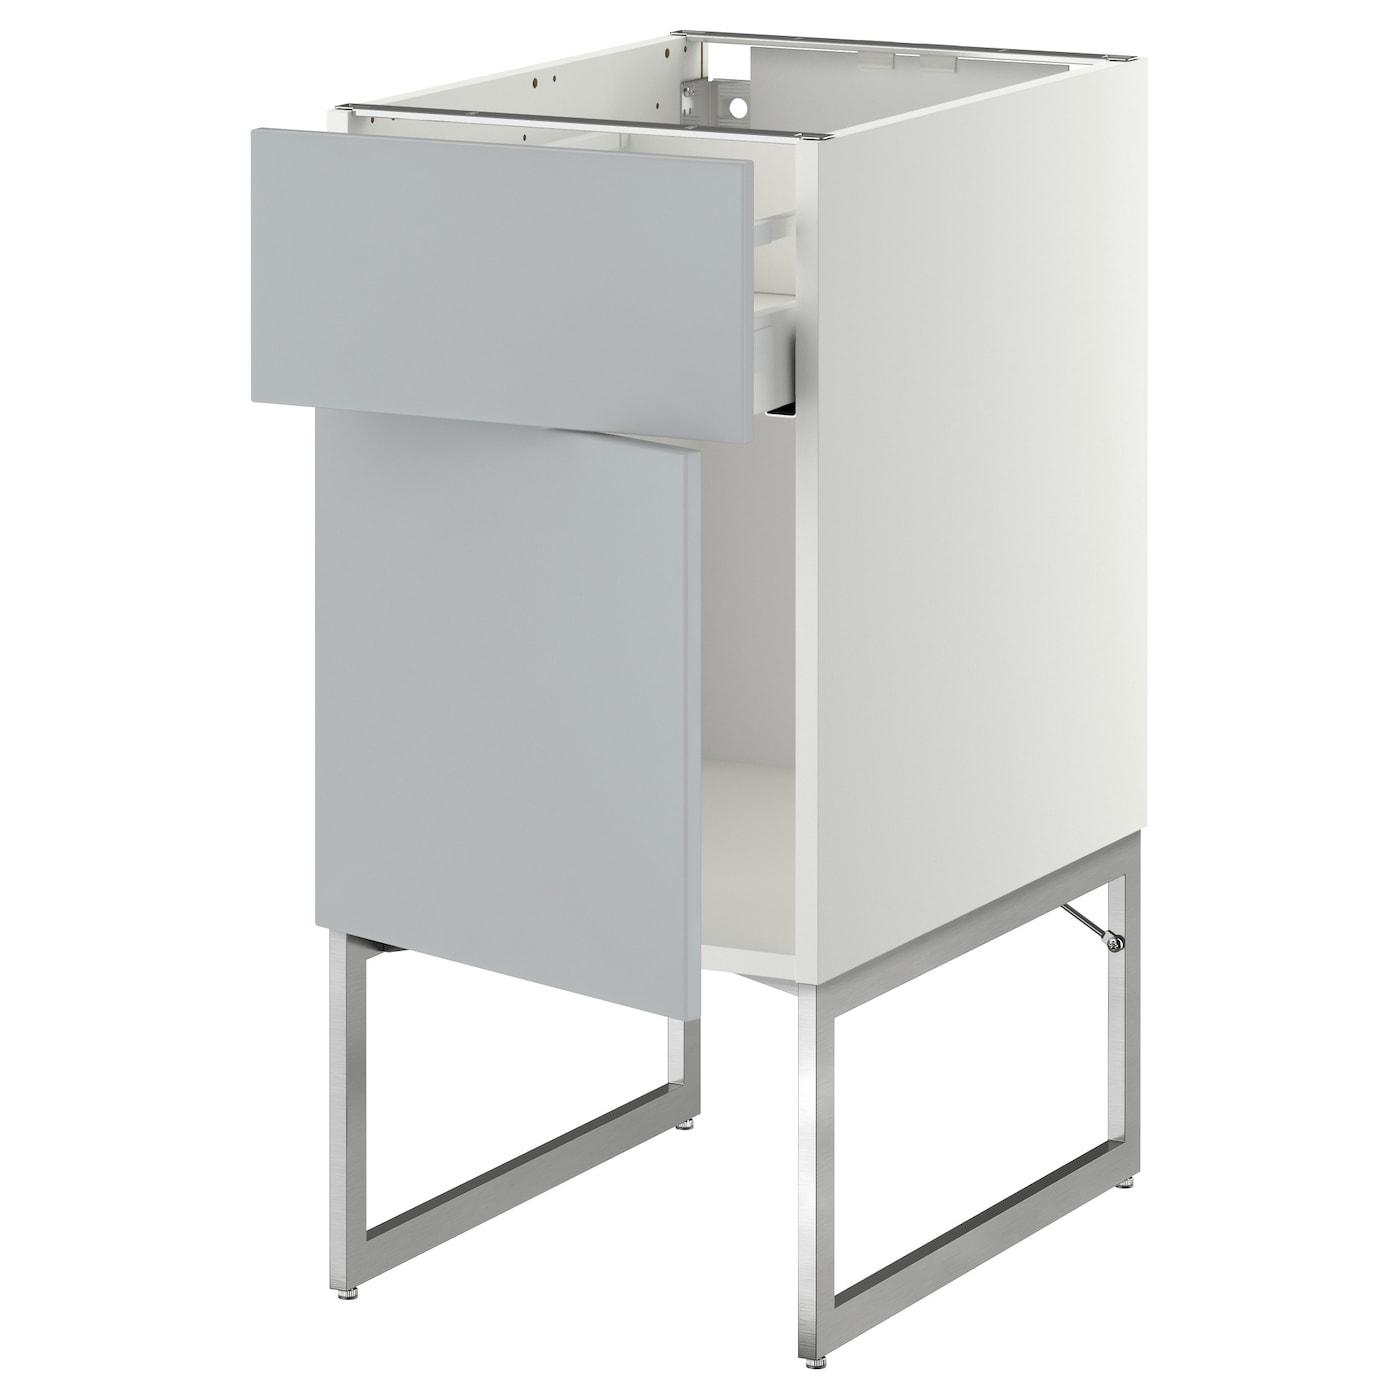 metod maximera base cabinet with drawer door white veddinge grey 40x60x60 cm ikea. Black Bedroom Furniture Sets. Home Design Ideas